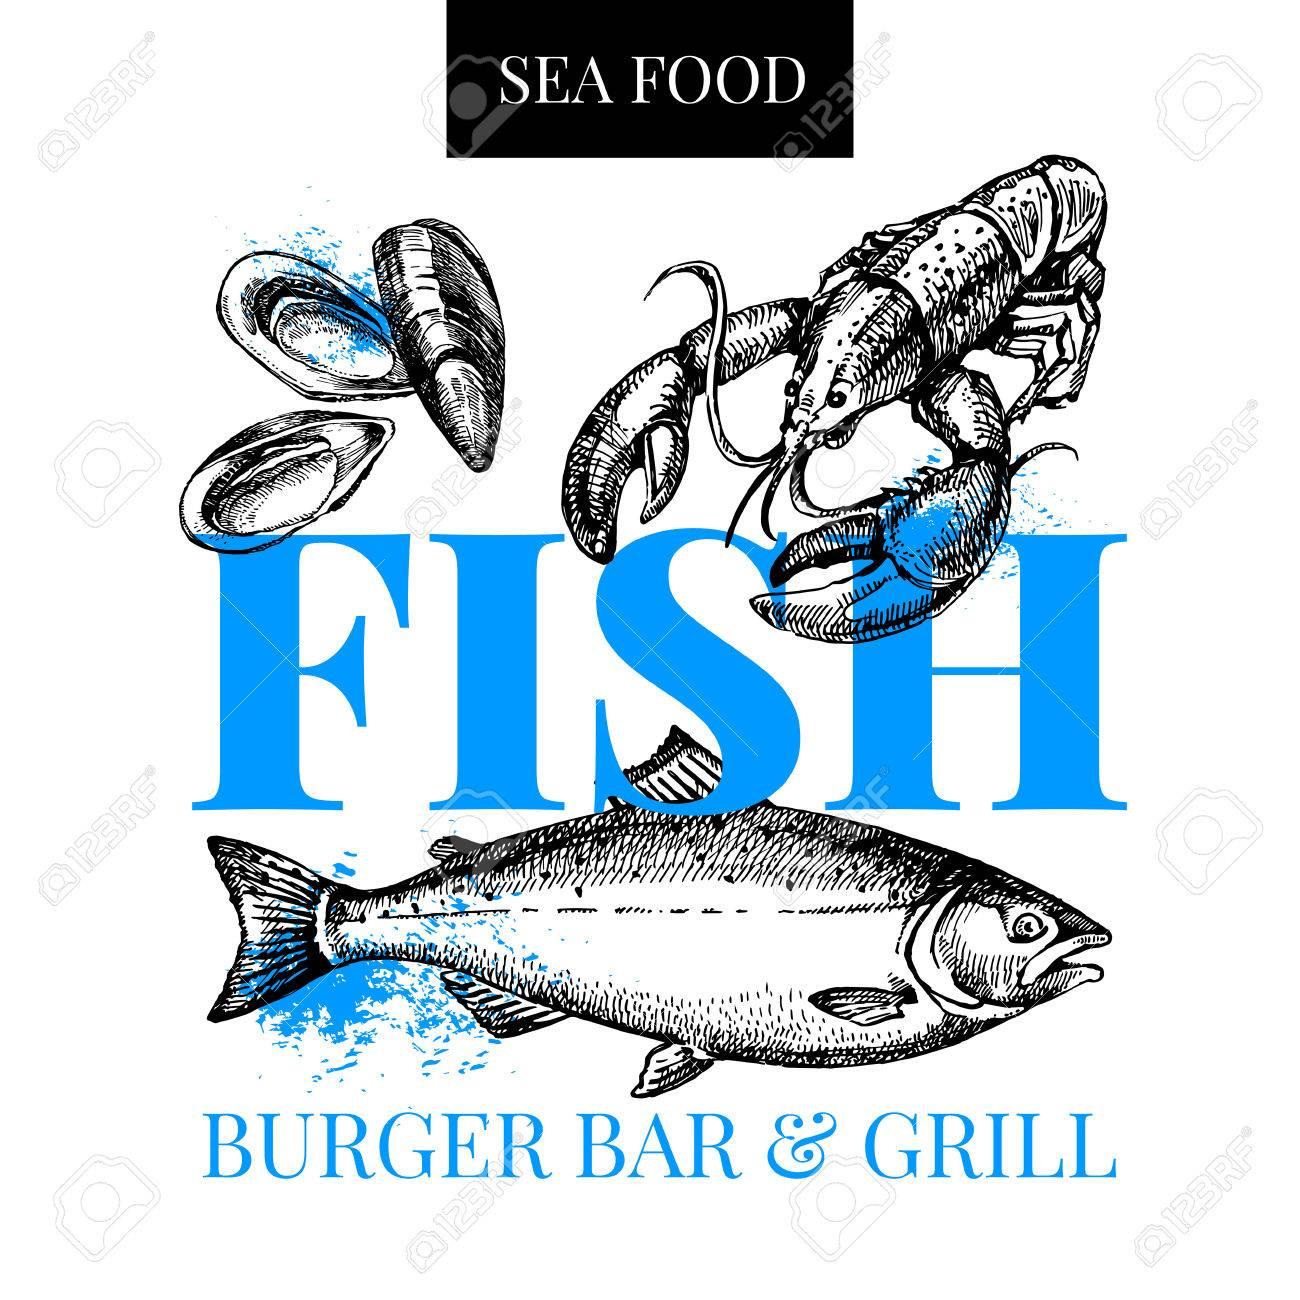 Restaurant Fresh Sea Food Menu Fish Market Poster Hand Drawn Sketch Vector Illustration Stock